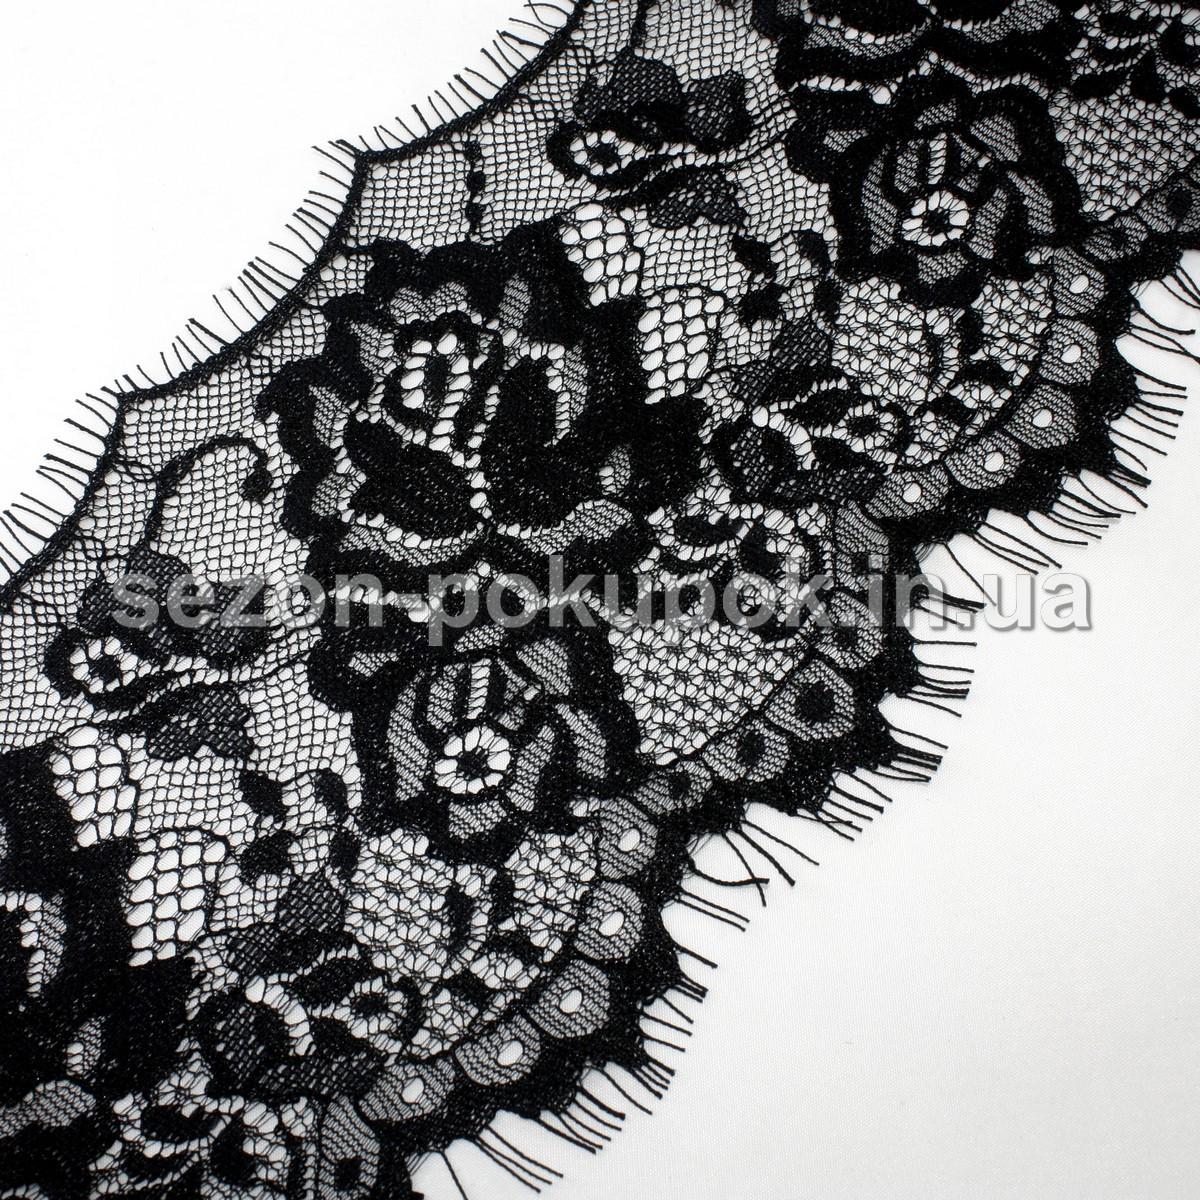 (3 метра)Французское кружево (Шантильи, с ресничками) ширина 12см (цена за 3 м). Цвет - черный